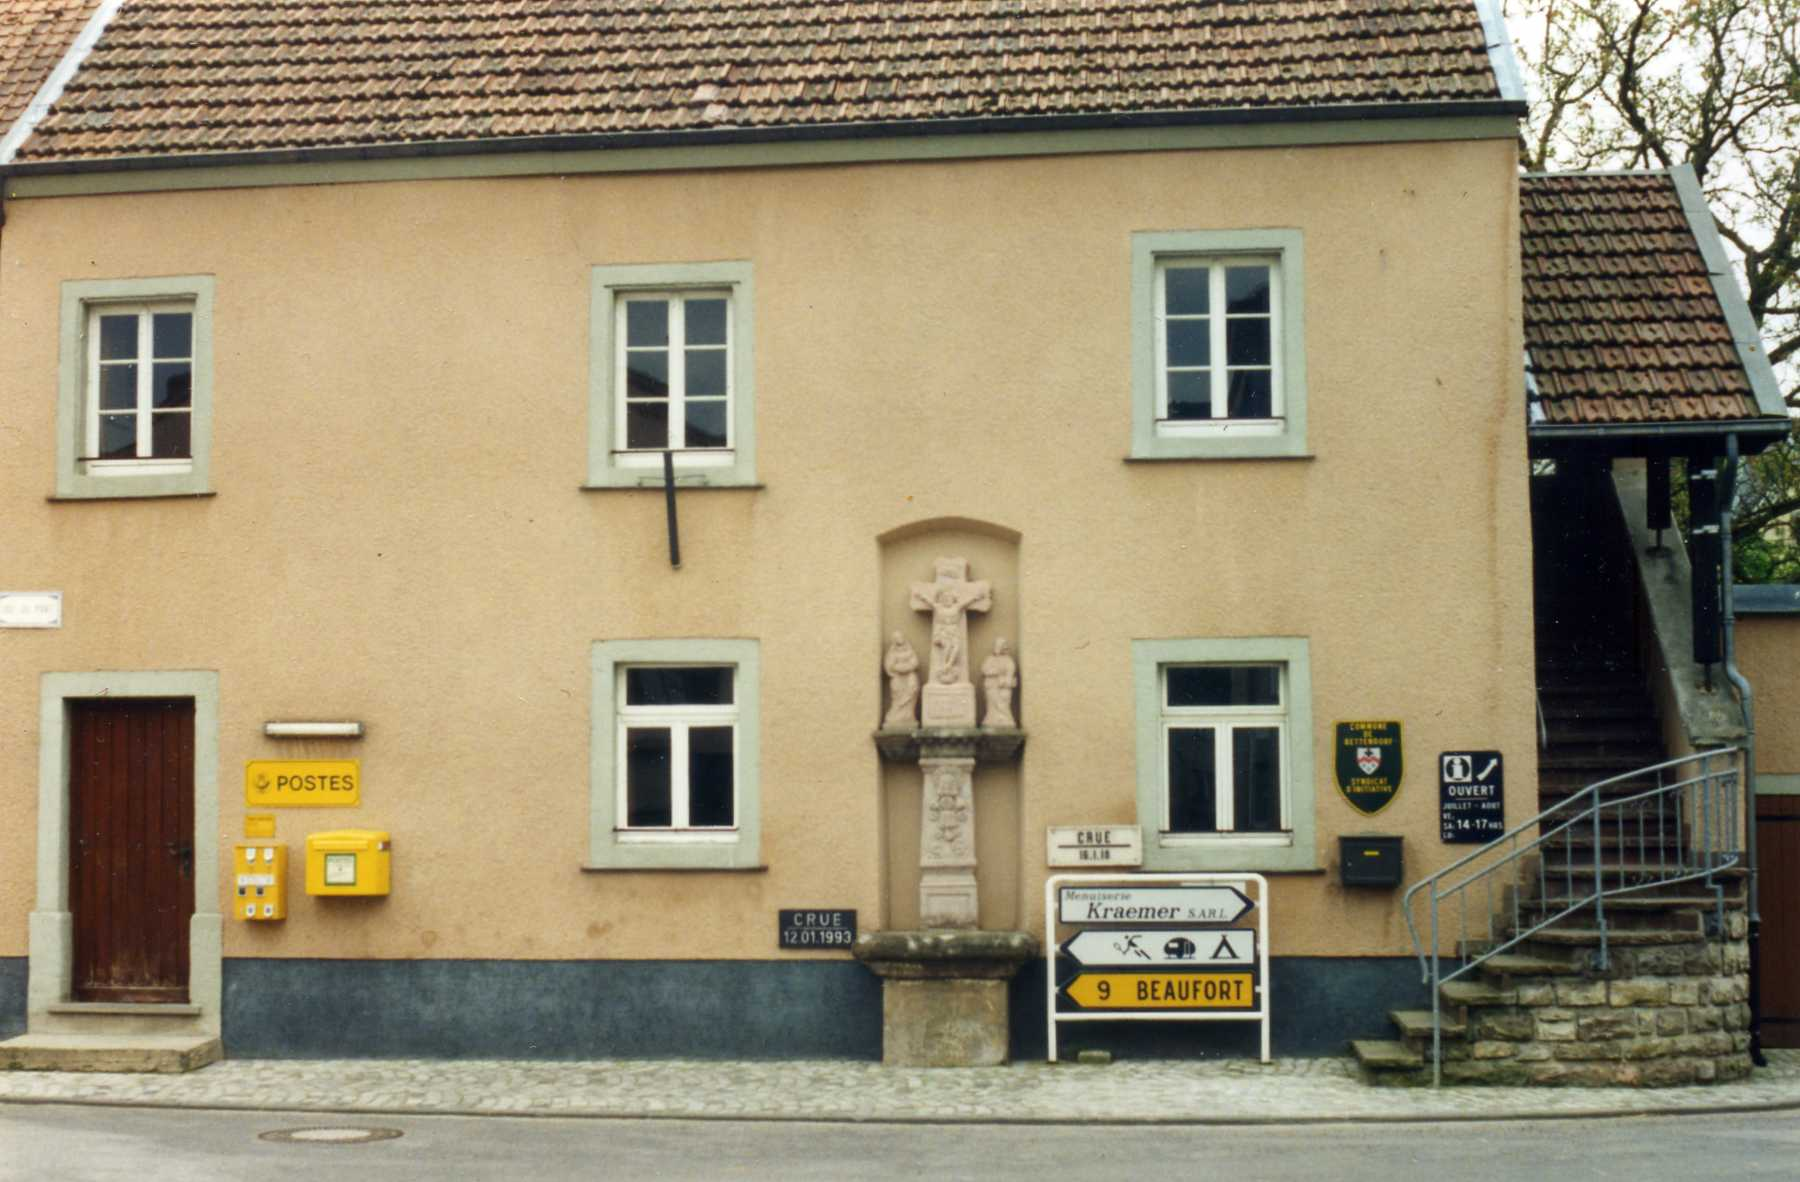 File:post office bureau de poste bettendorf luxembourg may 1995